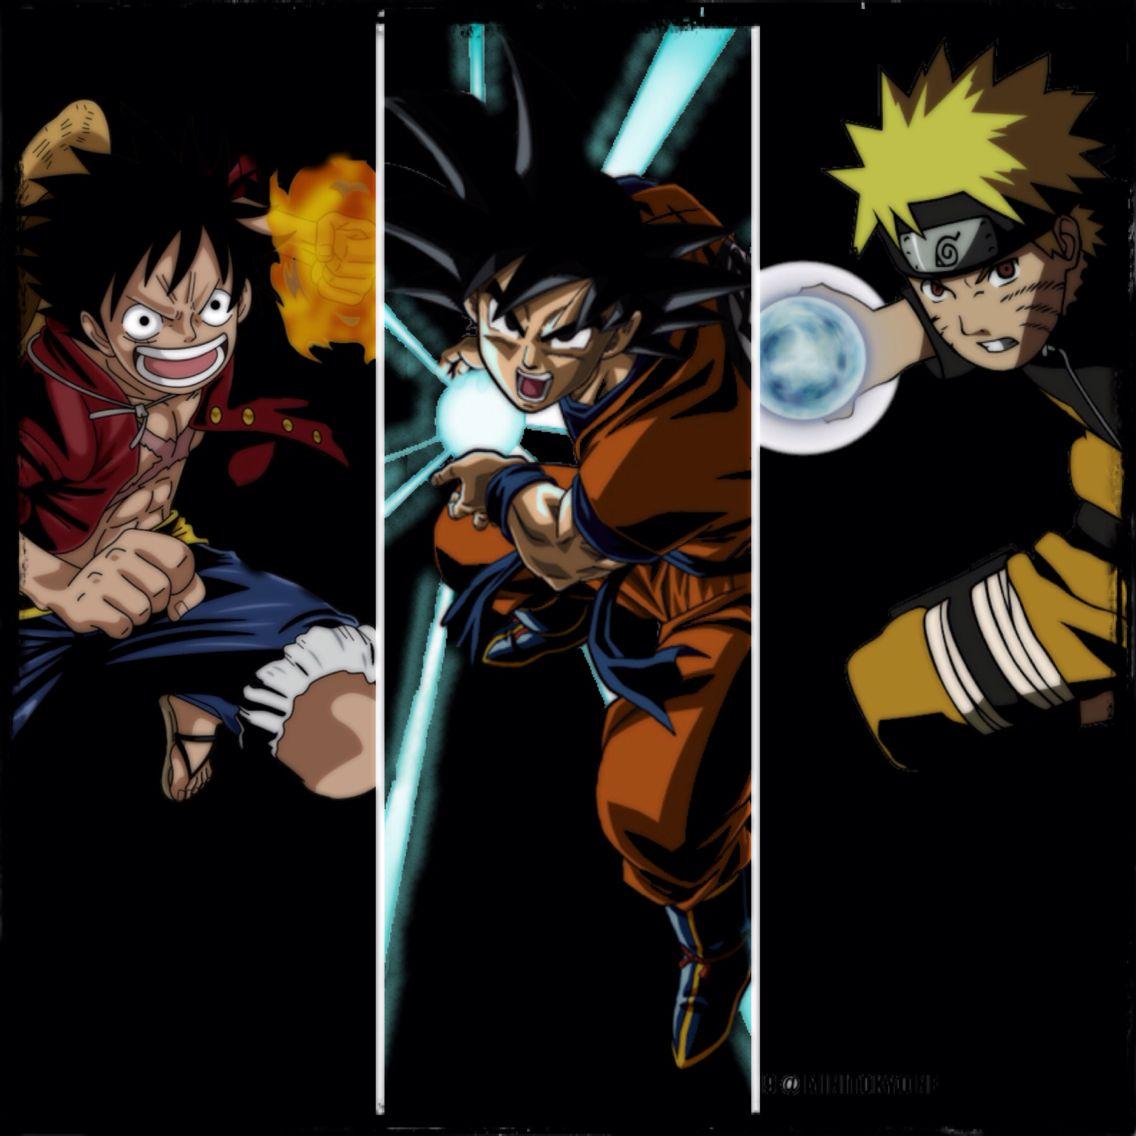 Luffy Goku And Naruto I Especially Love The Show One Piece Manga Anime Anime Crossover Anime Fantasy